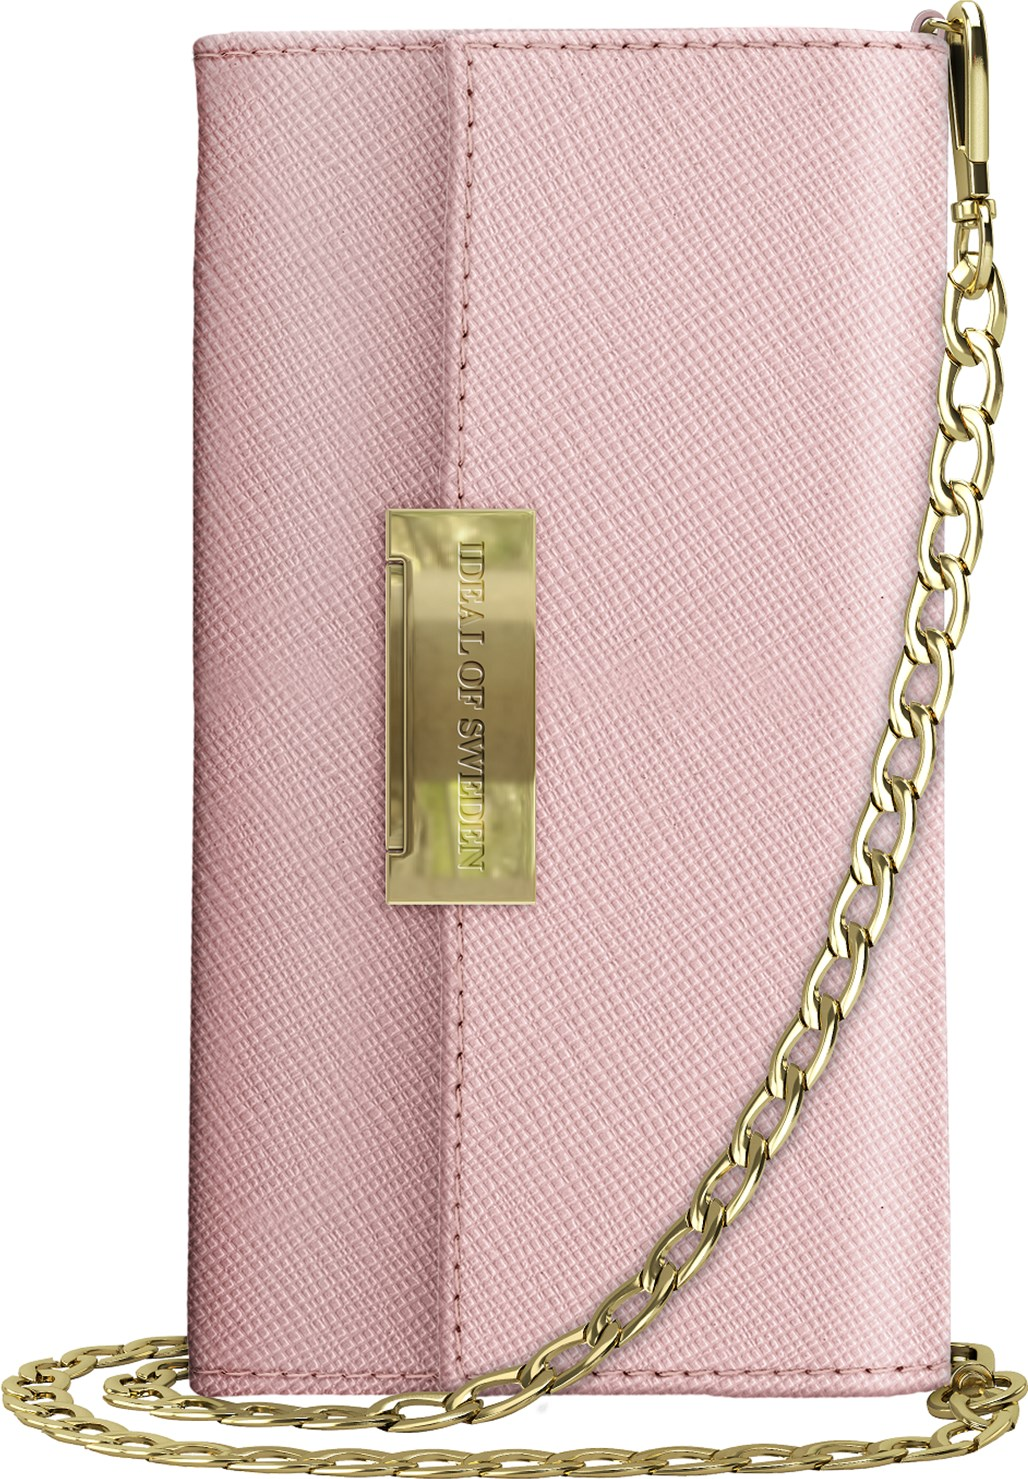 iDeal of Sweden Ideal Kensington Cross Body Clutch Iphone X/Xs Pink